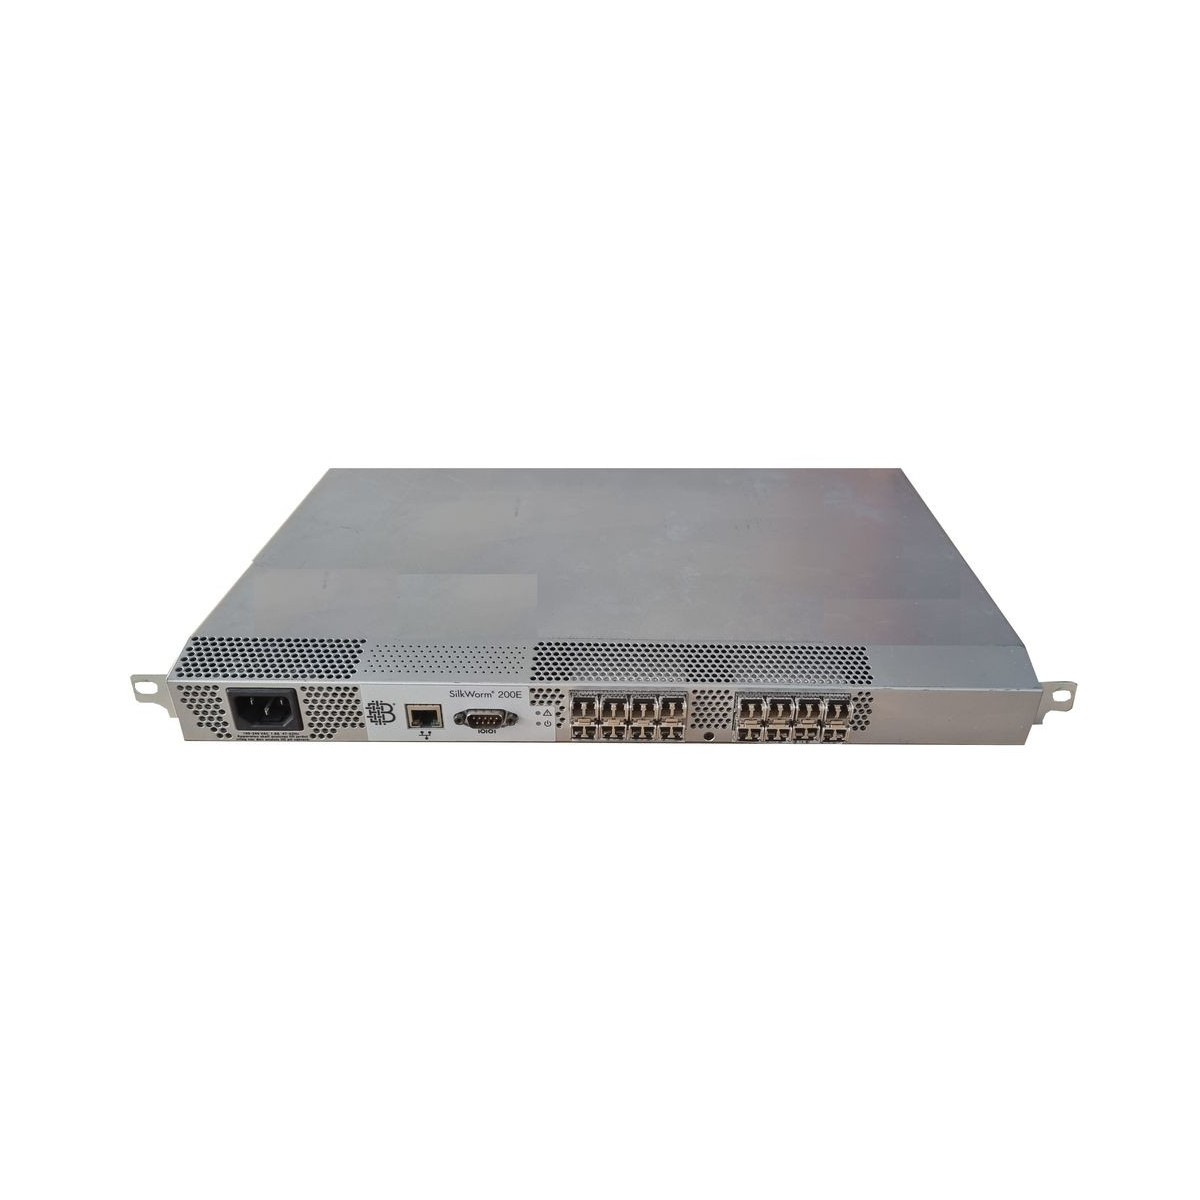 PAMIEC HP 1GB 1Rx4 PC2-3200R 400Mhz 345113-051